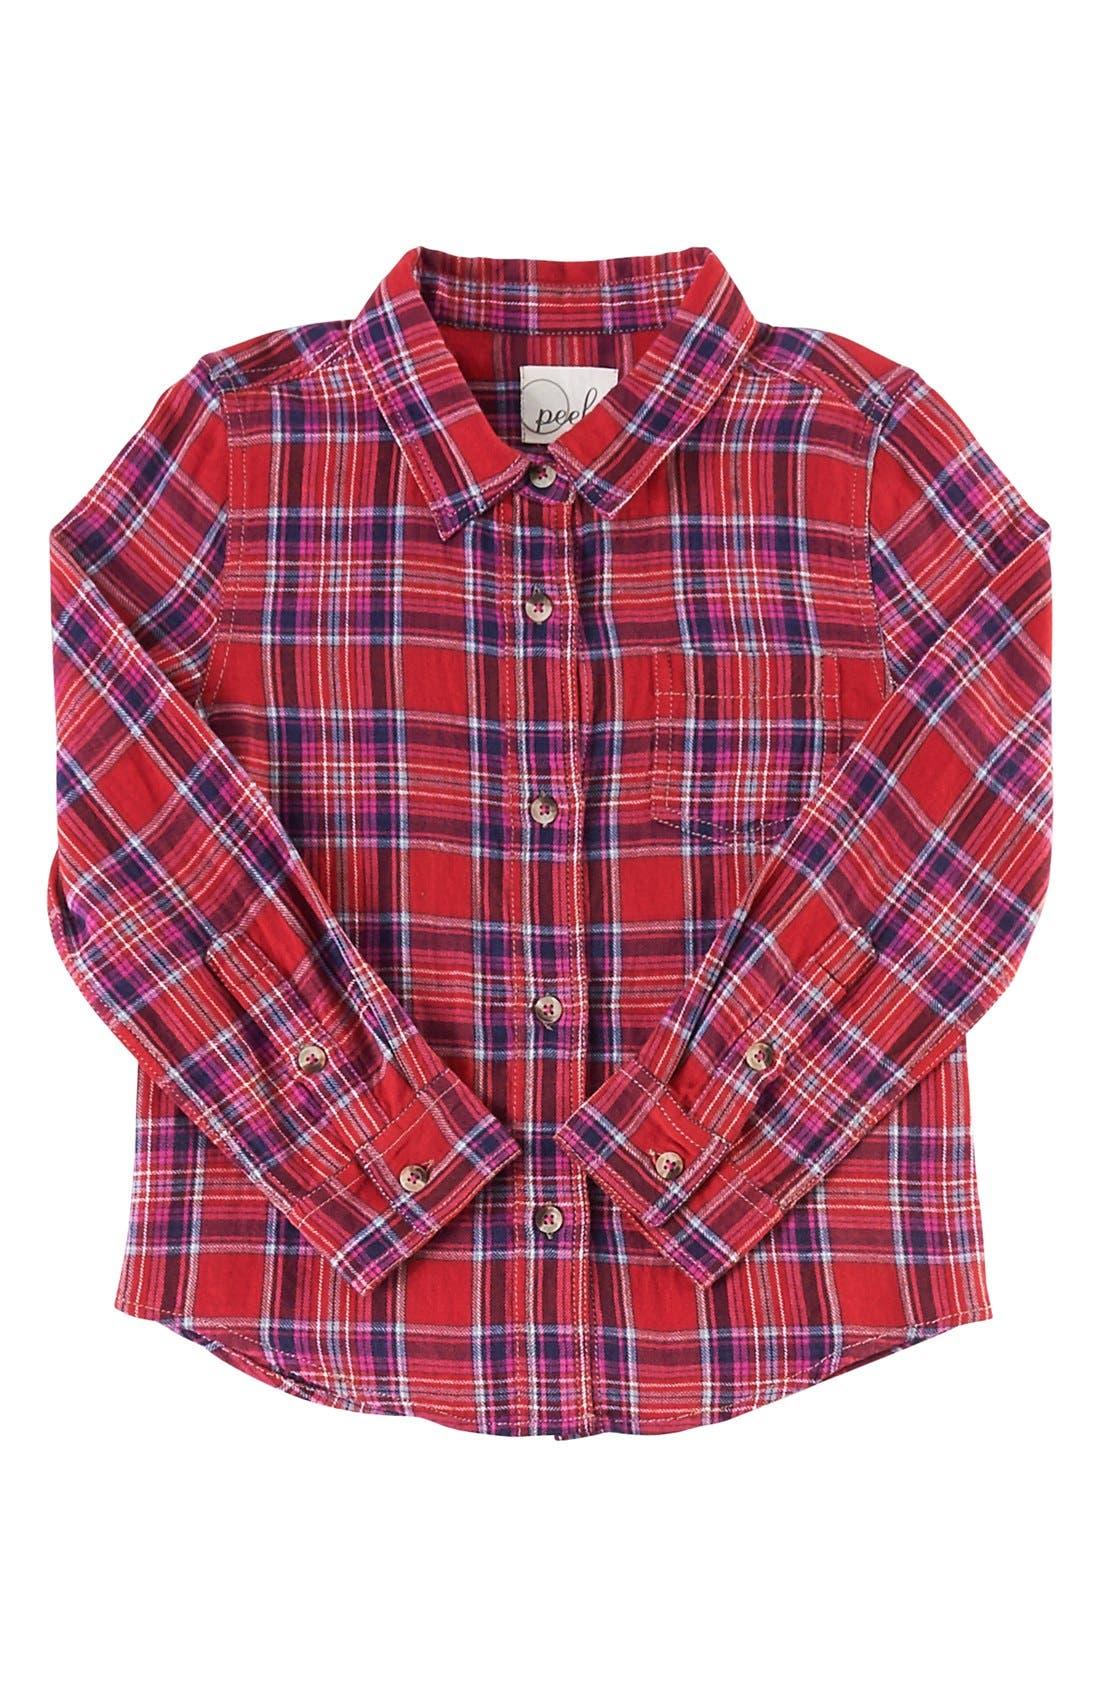 Alternate Image 1 Selected - Peek 'Belen' Plaid Flannel Shirt (Toddler Girls, Little Girls & Big Girls)